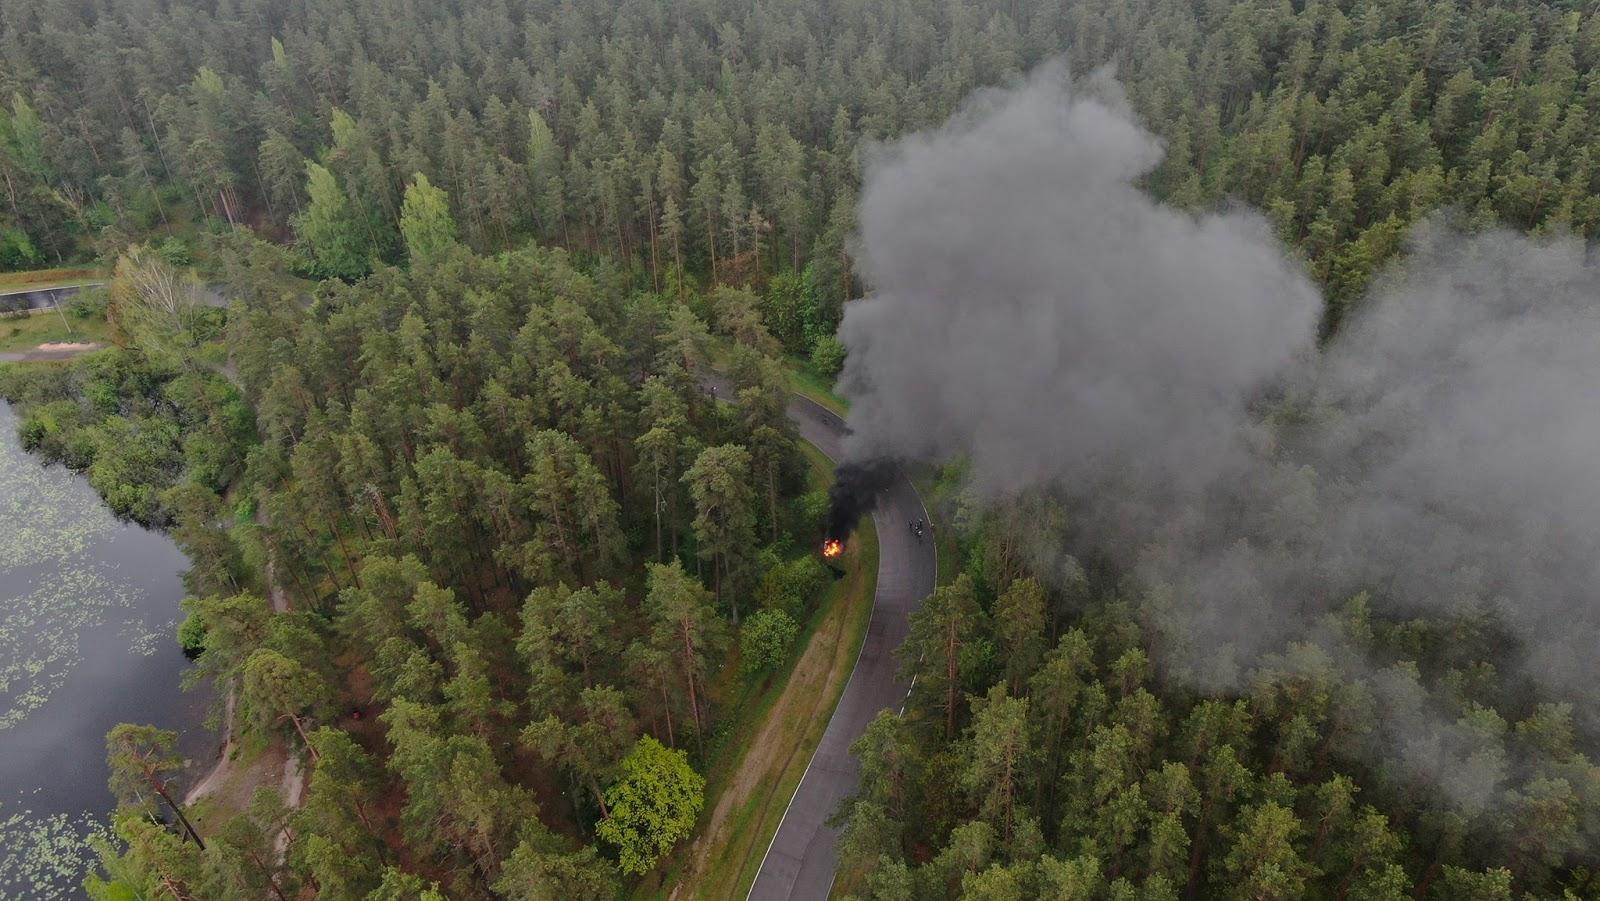 Melni dūmi ceļas no meža masīva